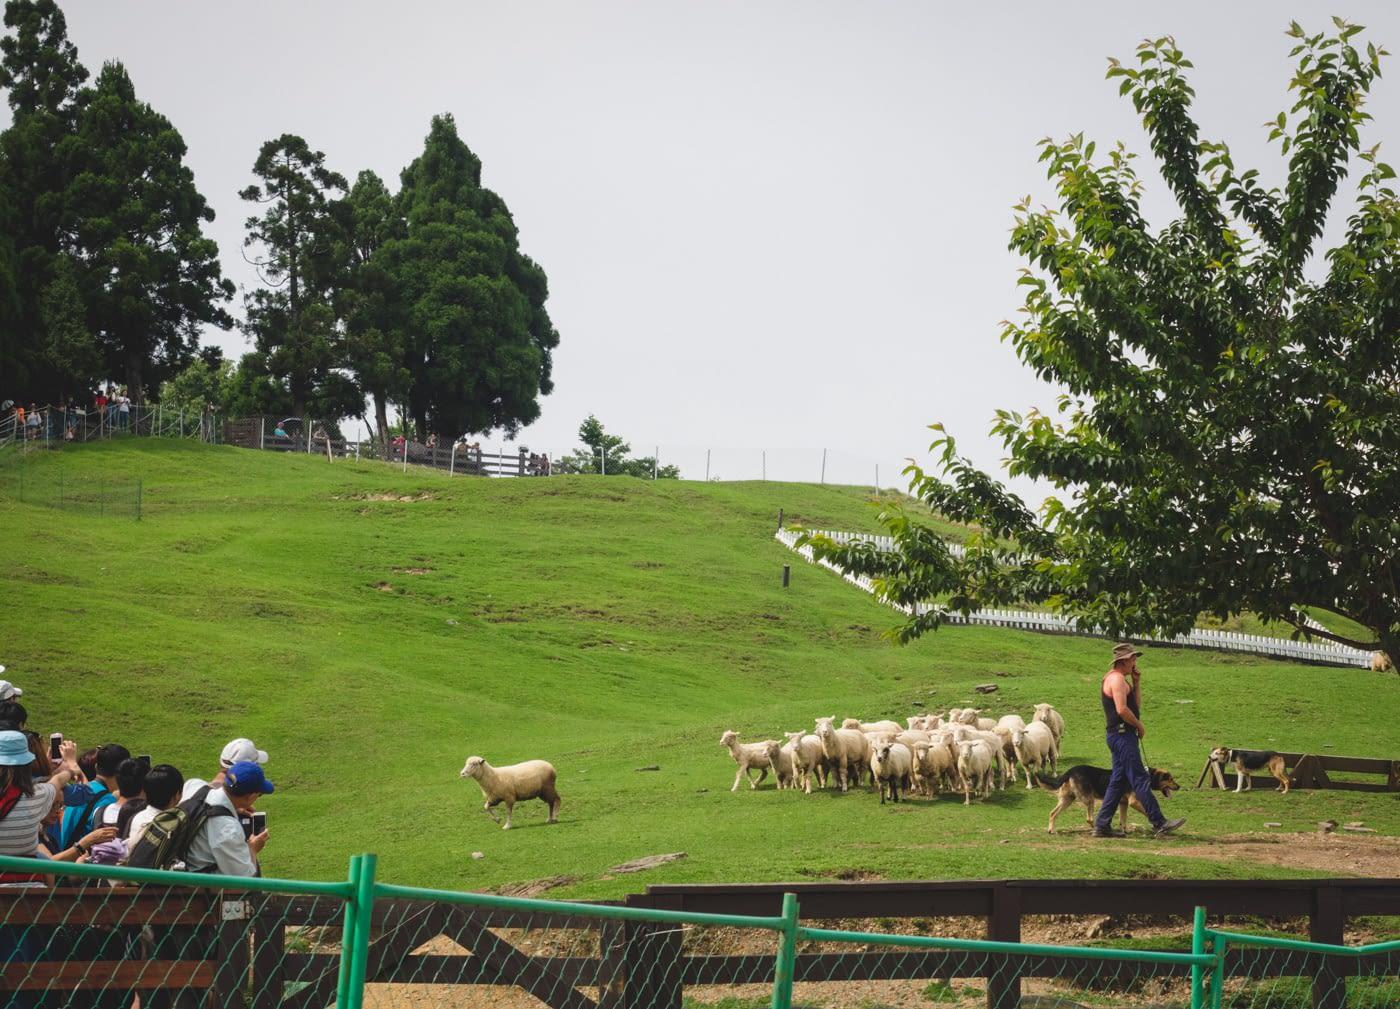 Taiwan - Qingjing Farm - Sheep herding